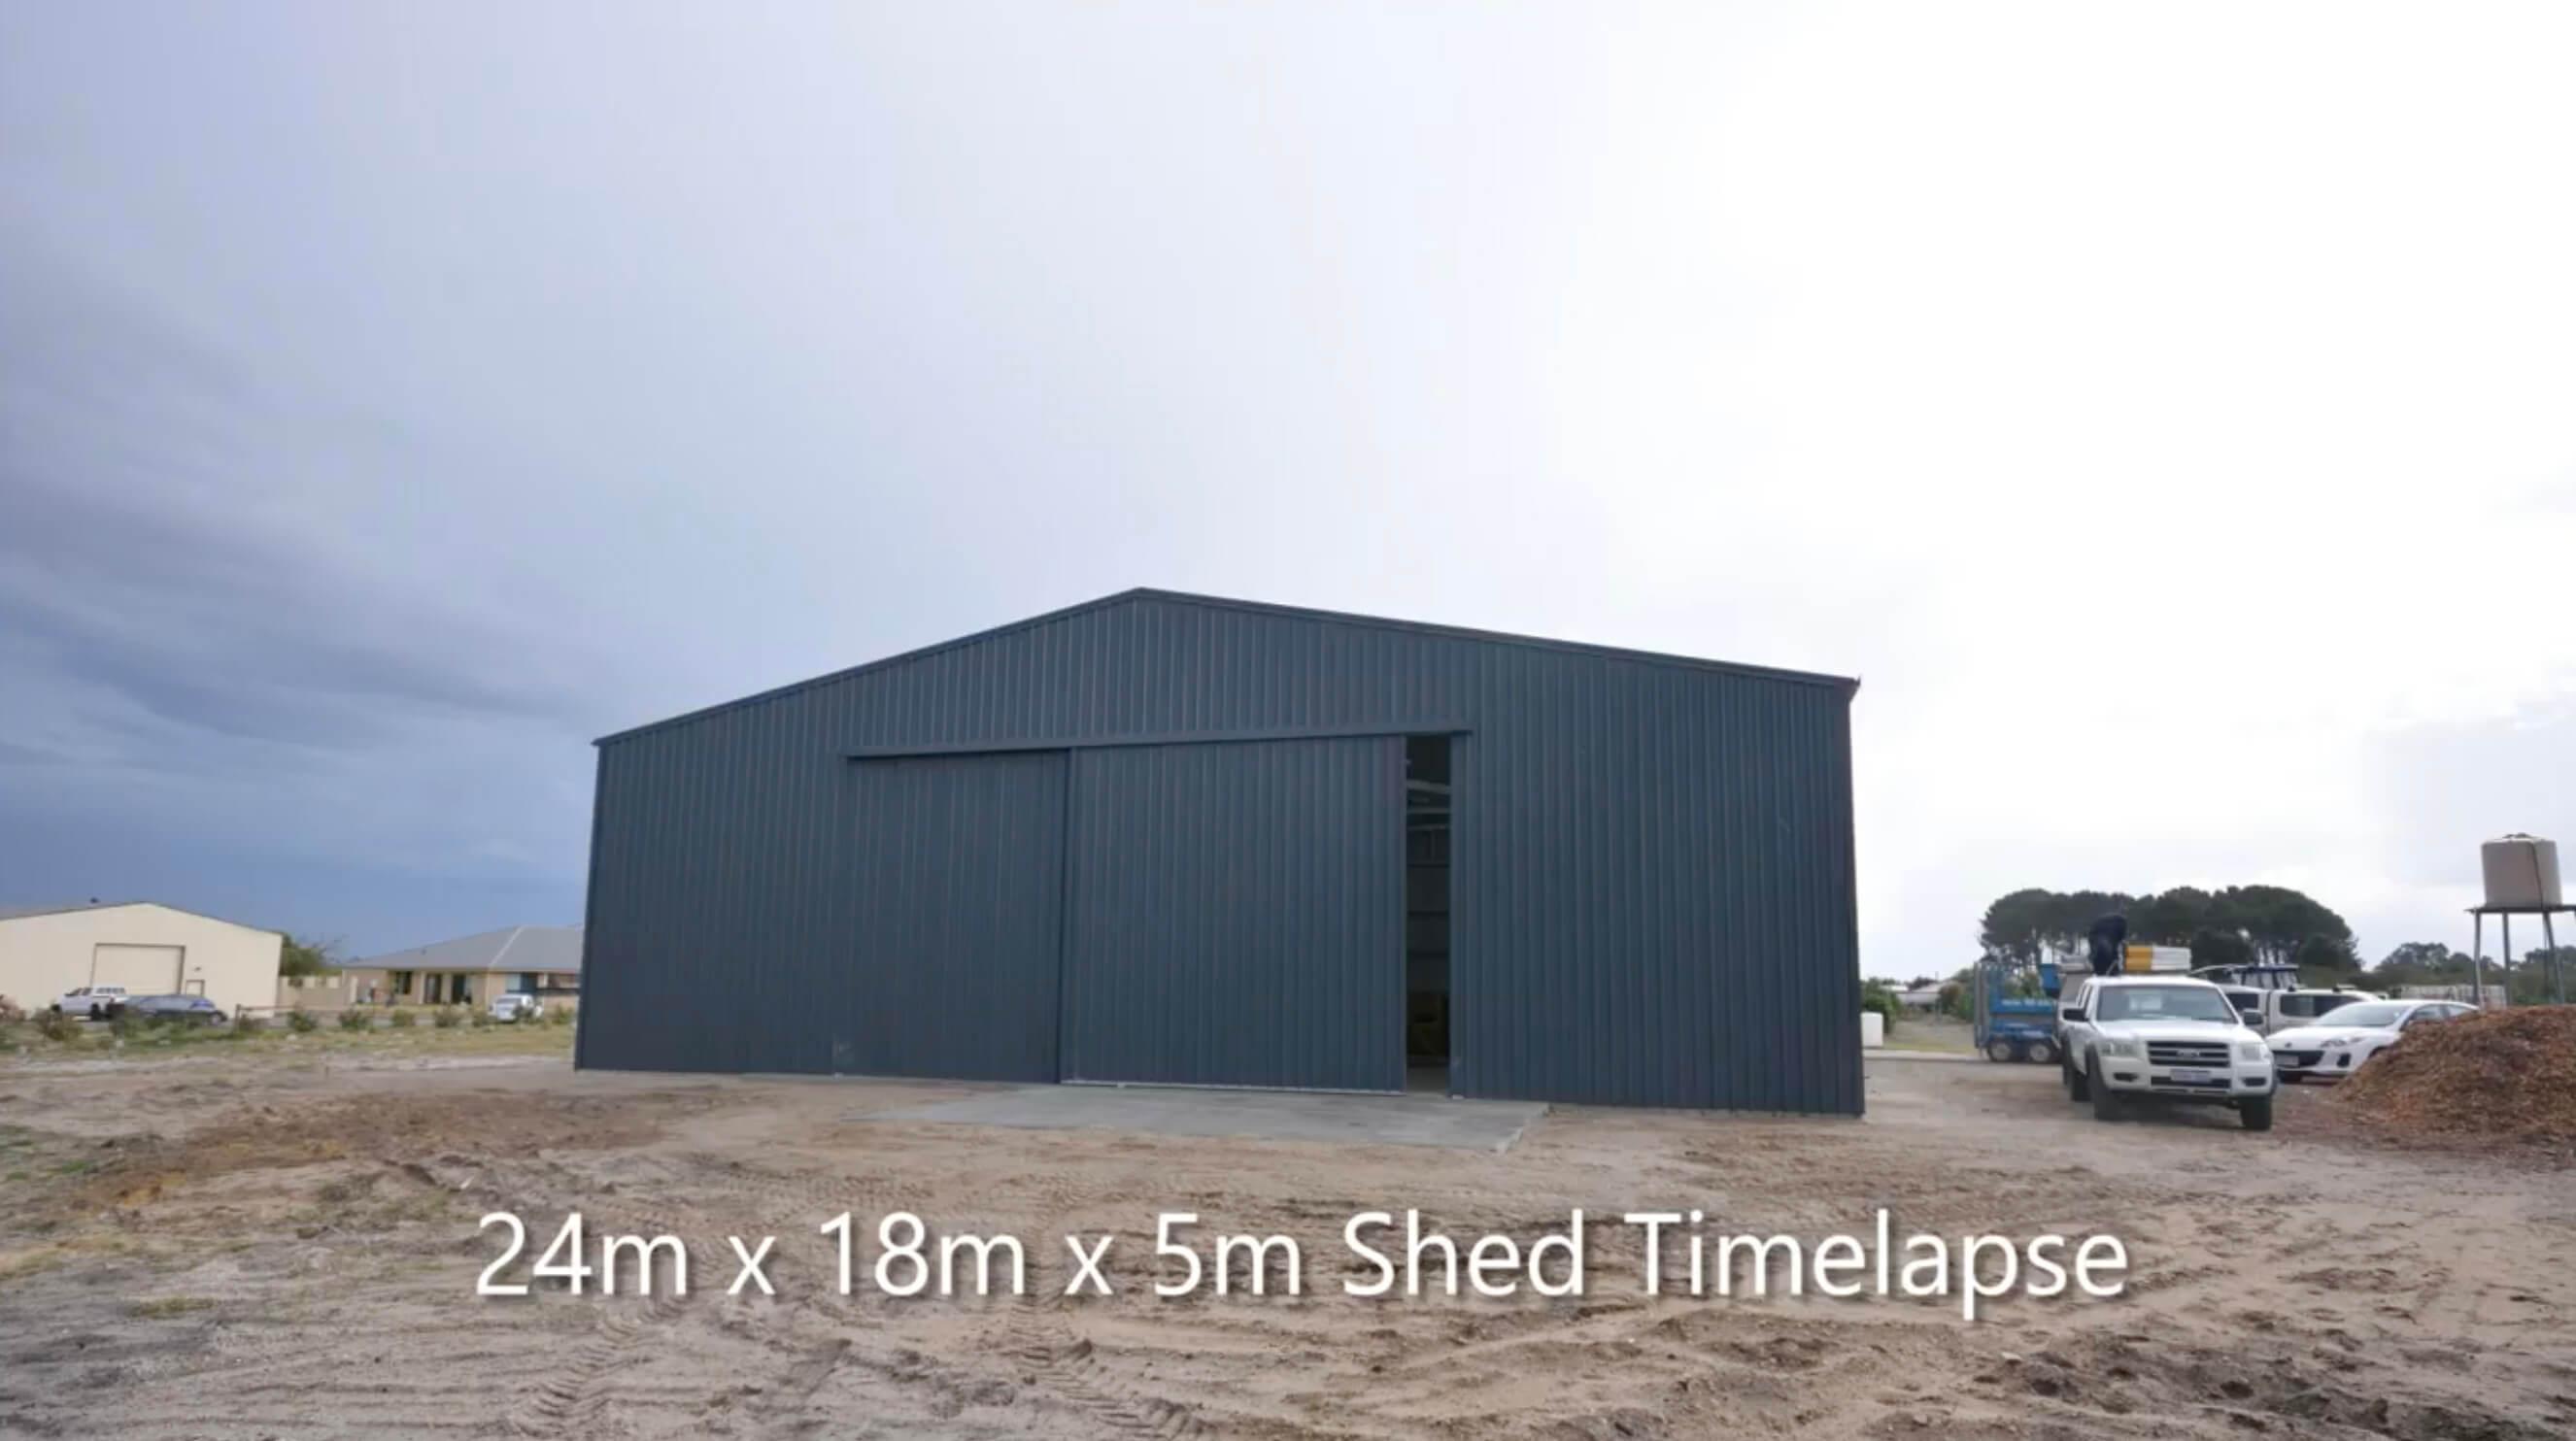 24m x 18m x 5m SHED in Australia - BDN Fasteners built using steel stud framing screws 3